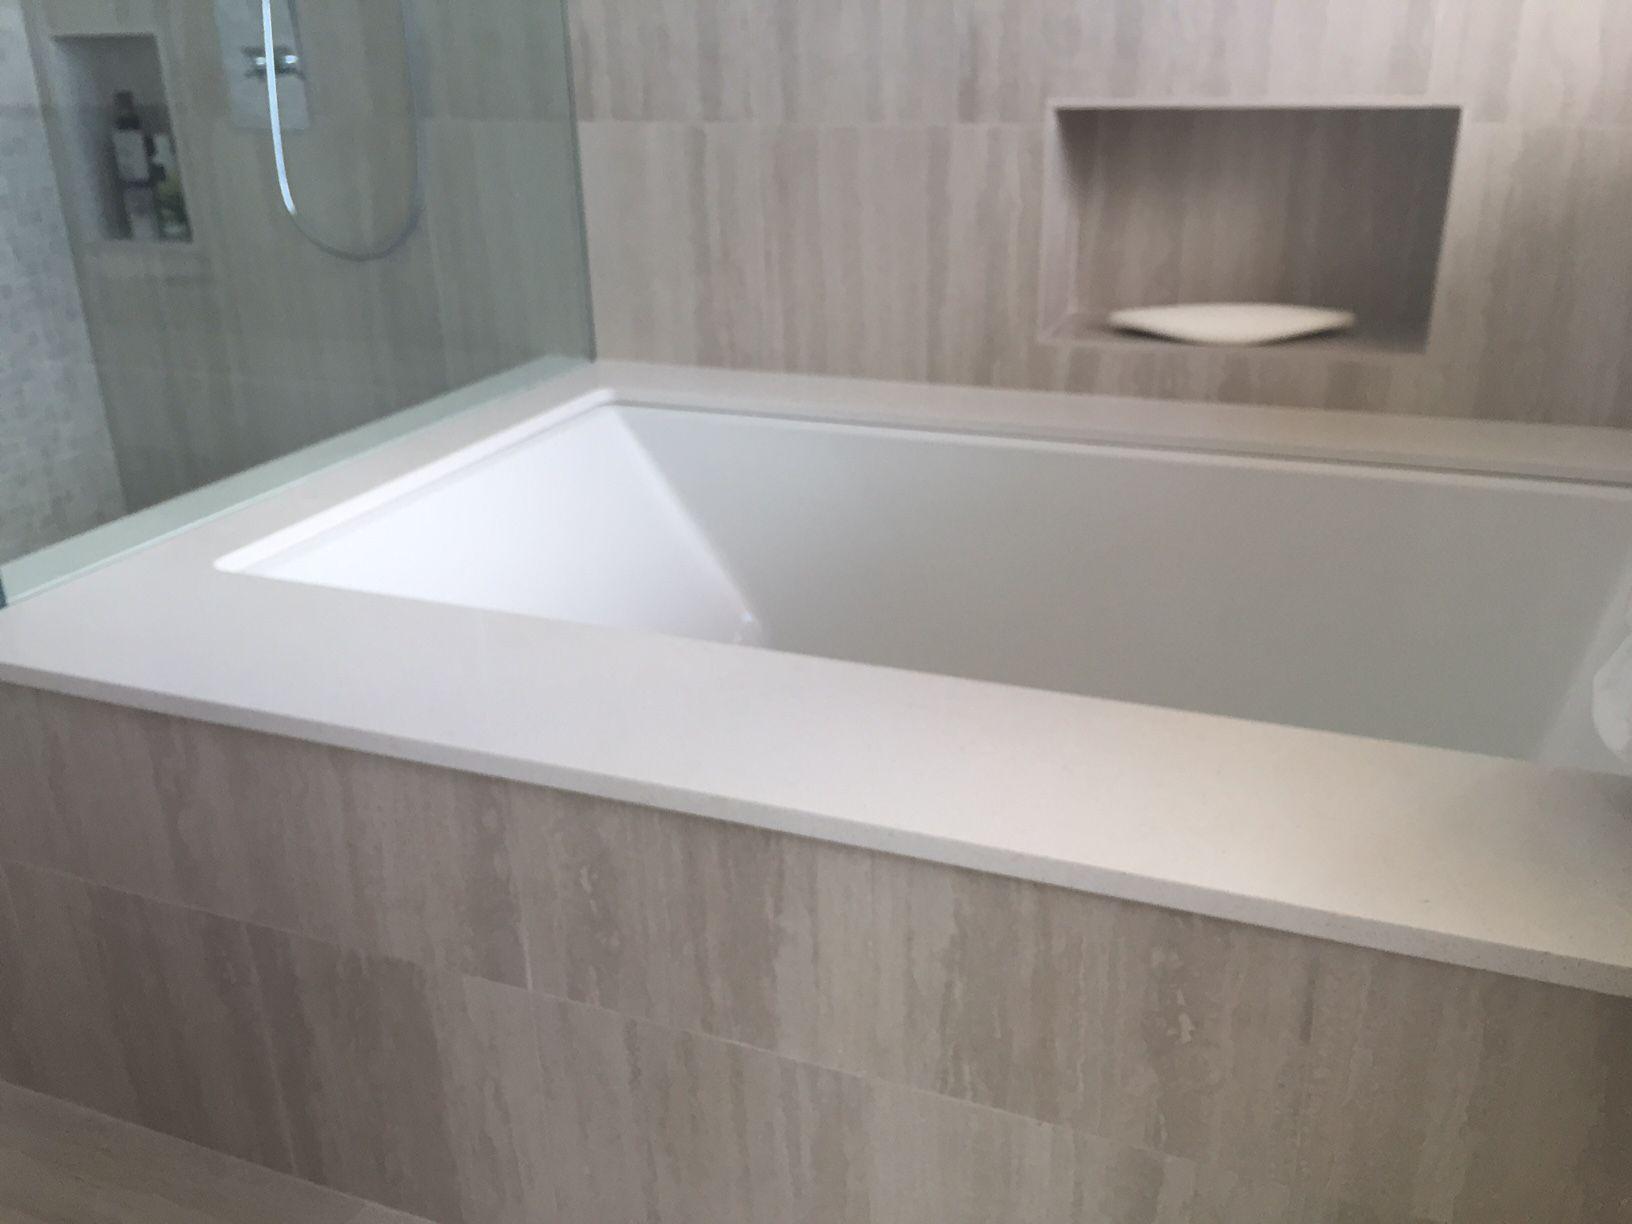 Caesarstone Quartz Tub Deck By Hawaii Kitchen Amp Bath